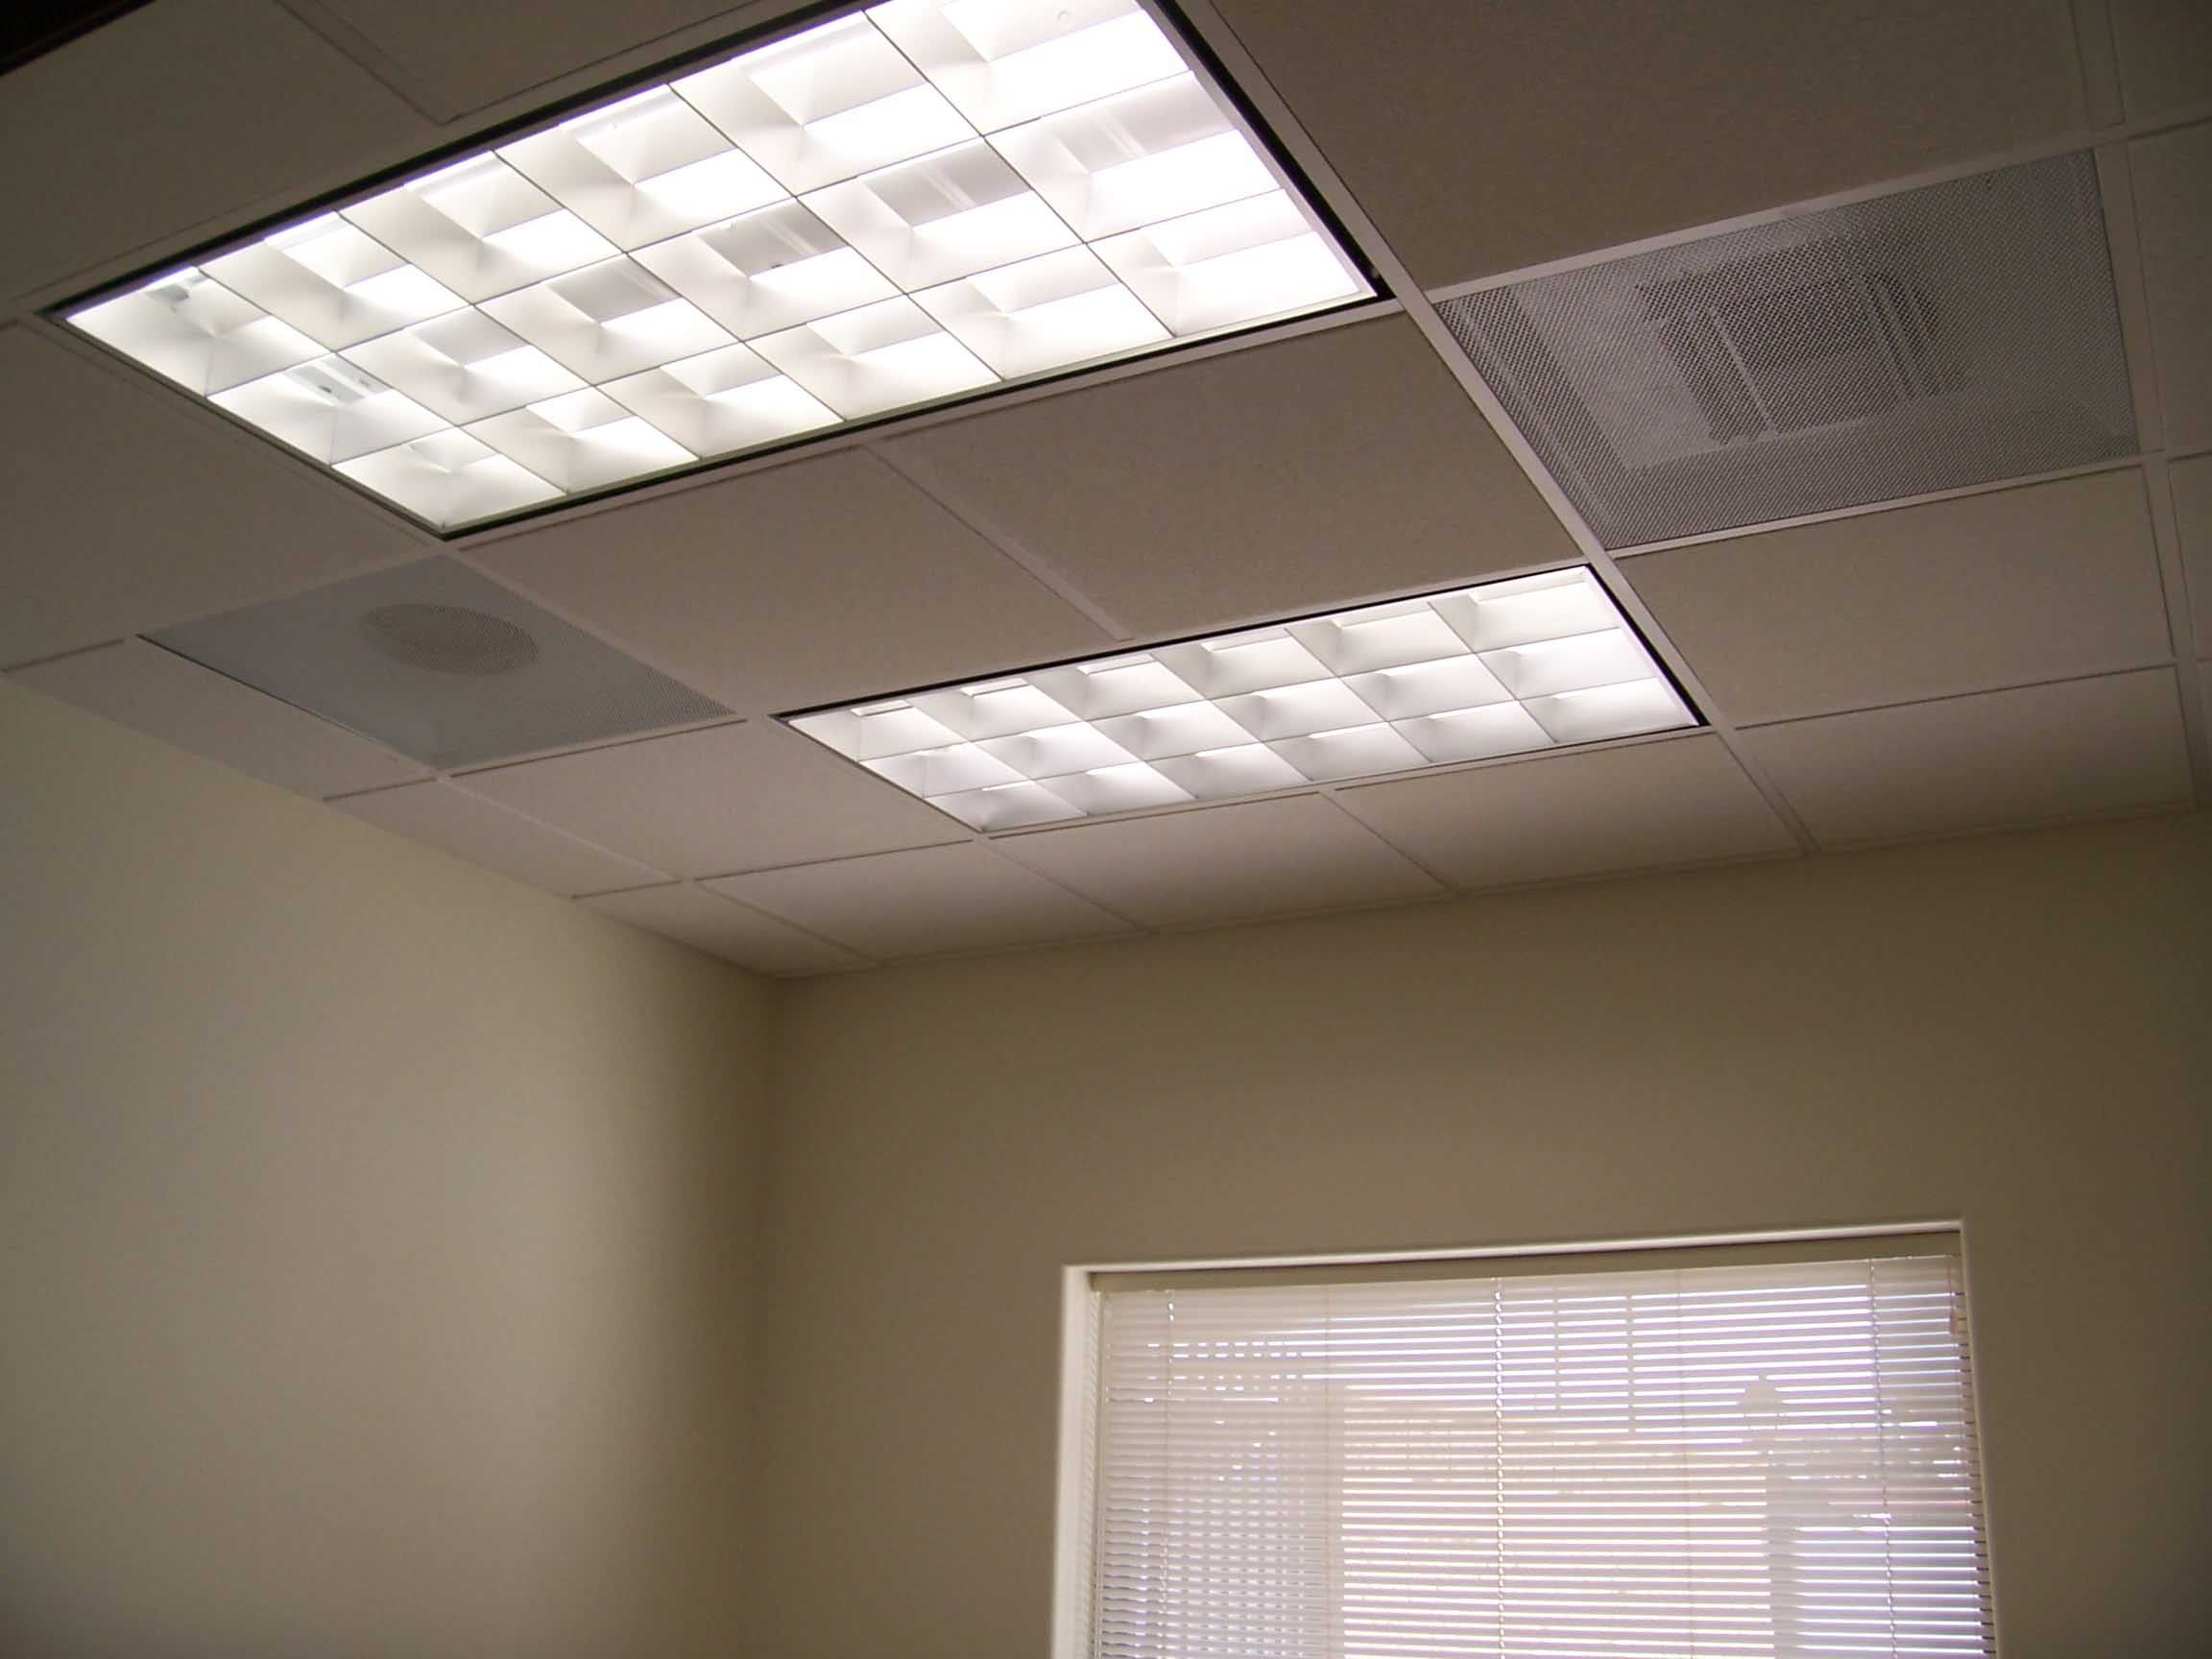 Fluorescent Ceiling Tile Lights